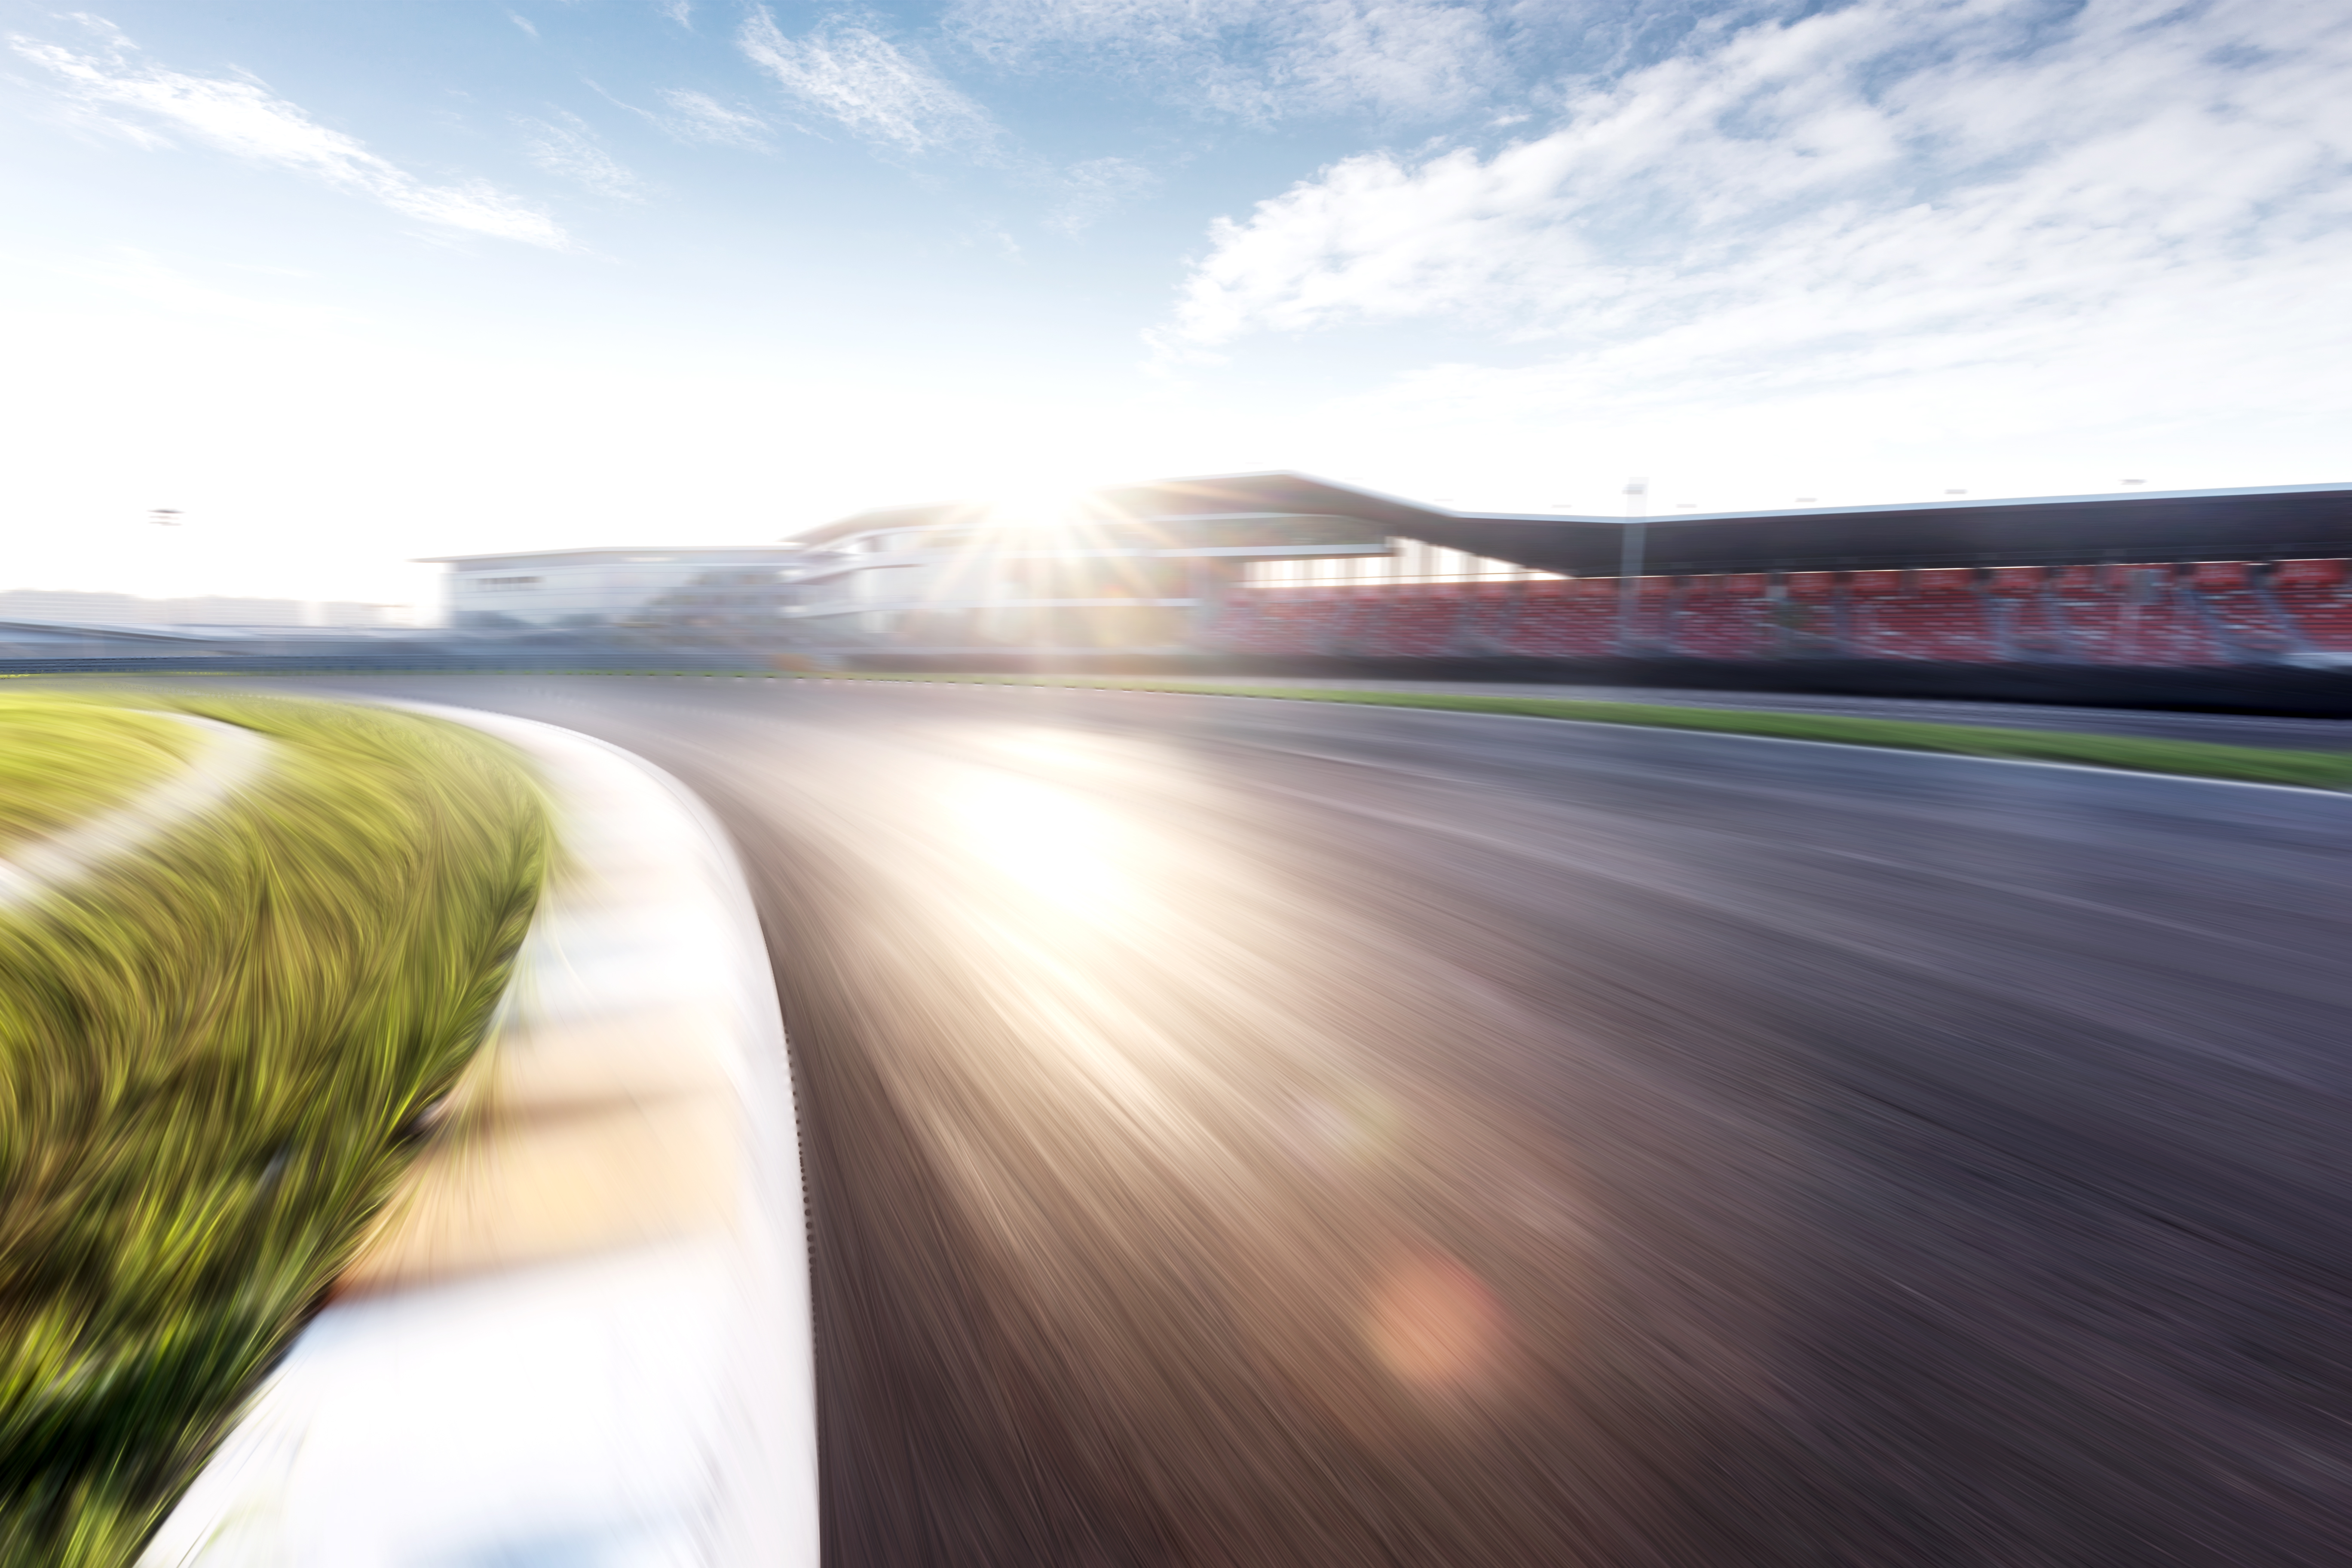 f1-track-empty